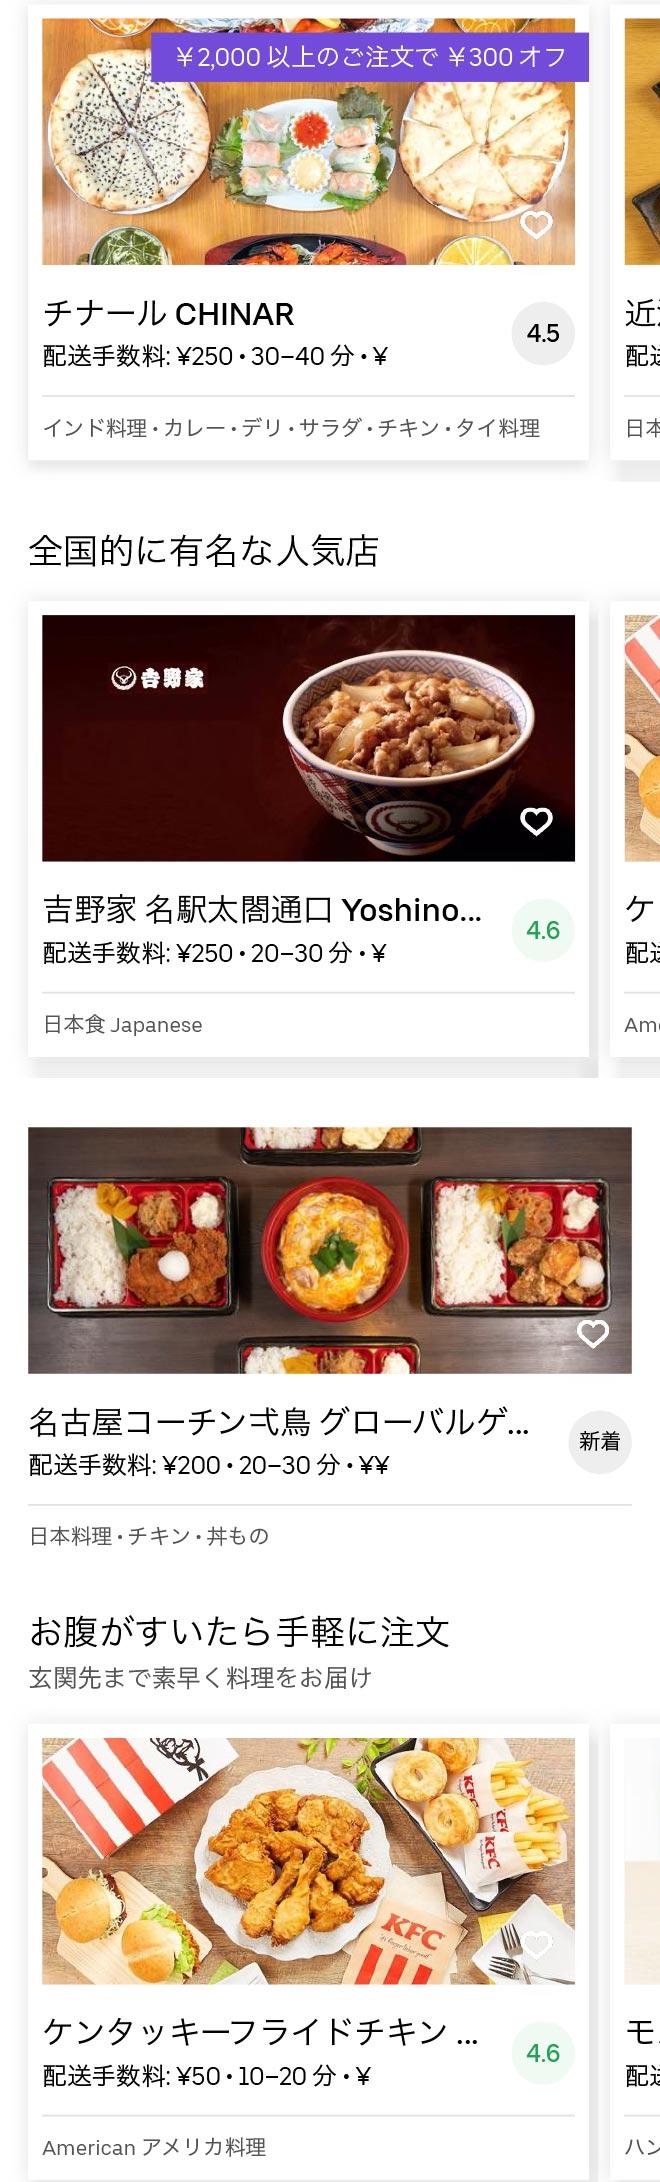 Nagoya nakamura menu 2005 01